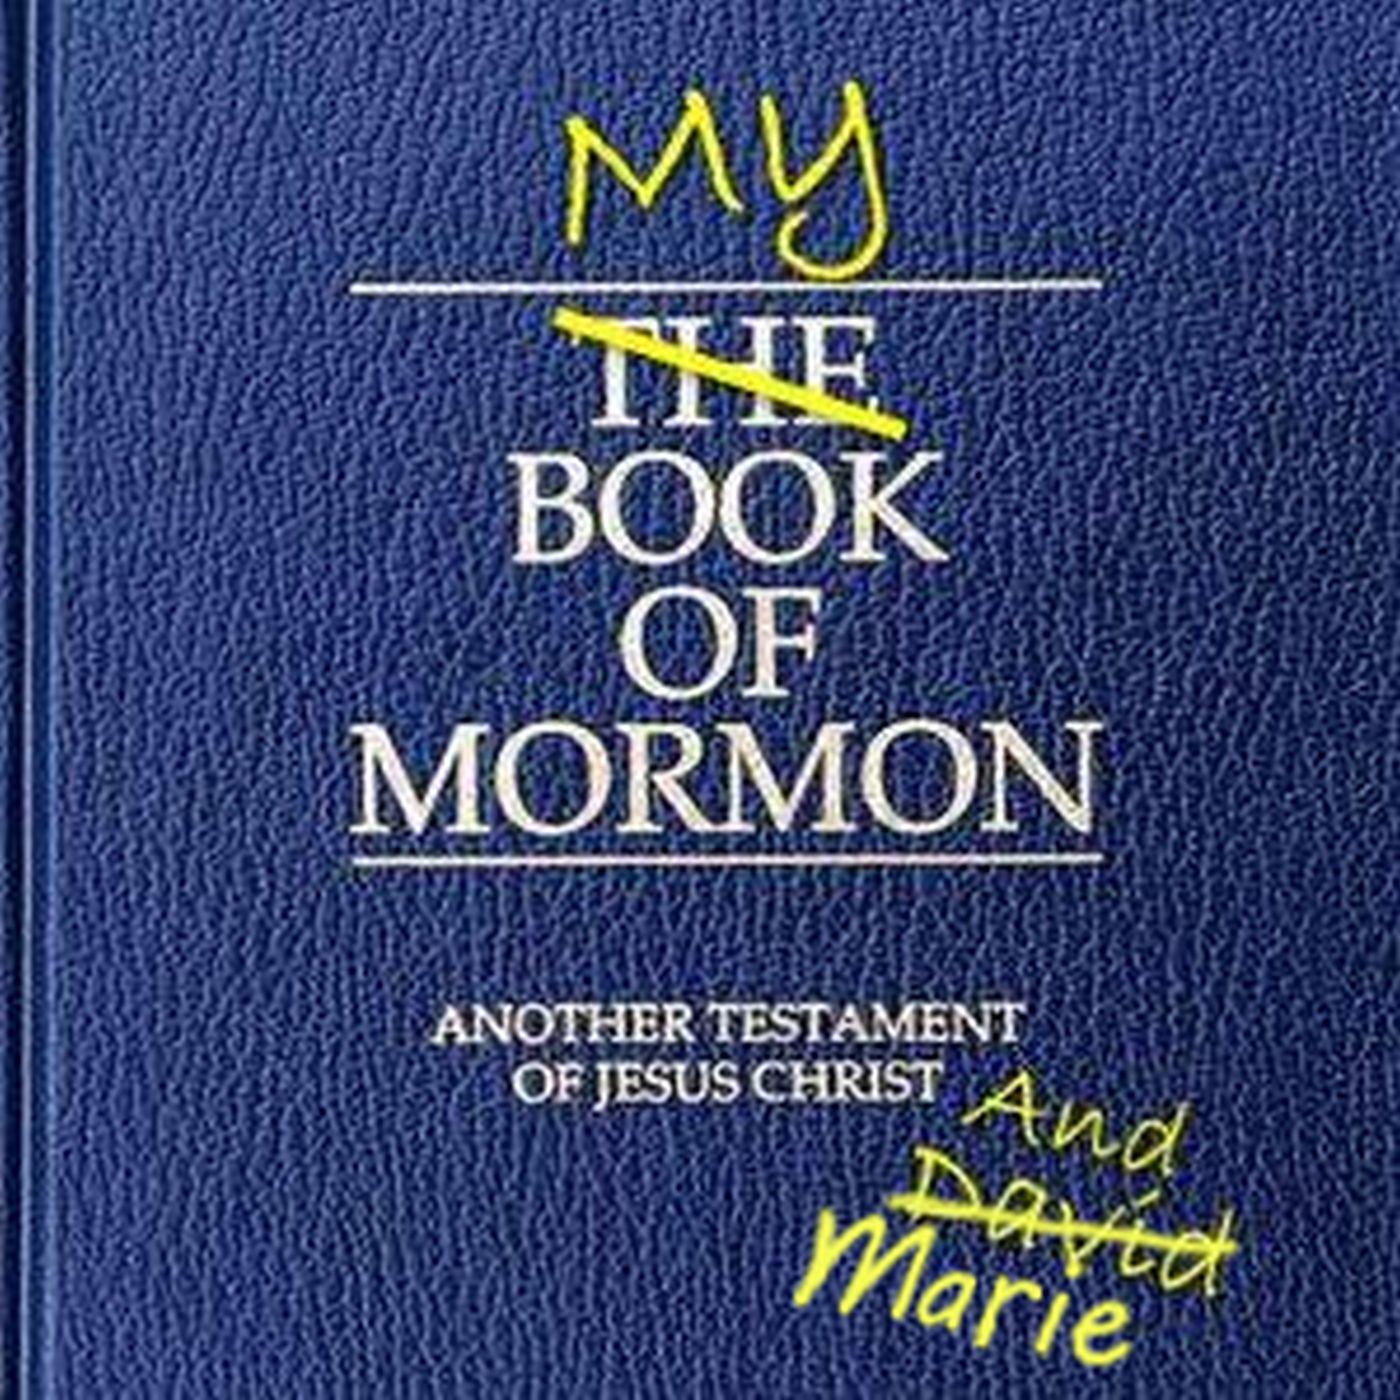 My Book of Mormon show art